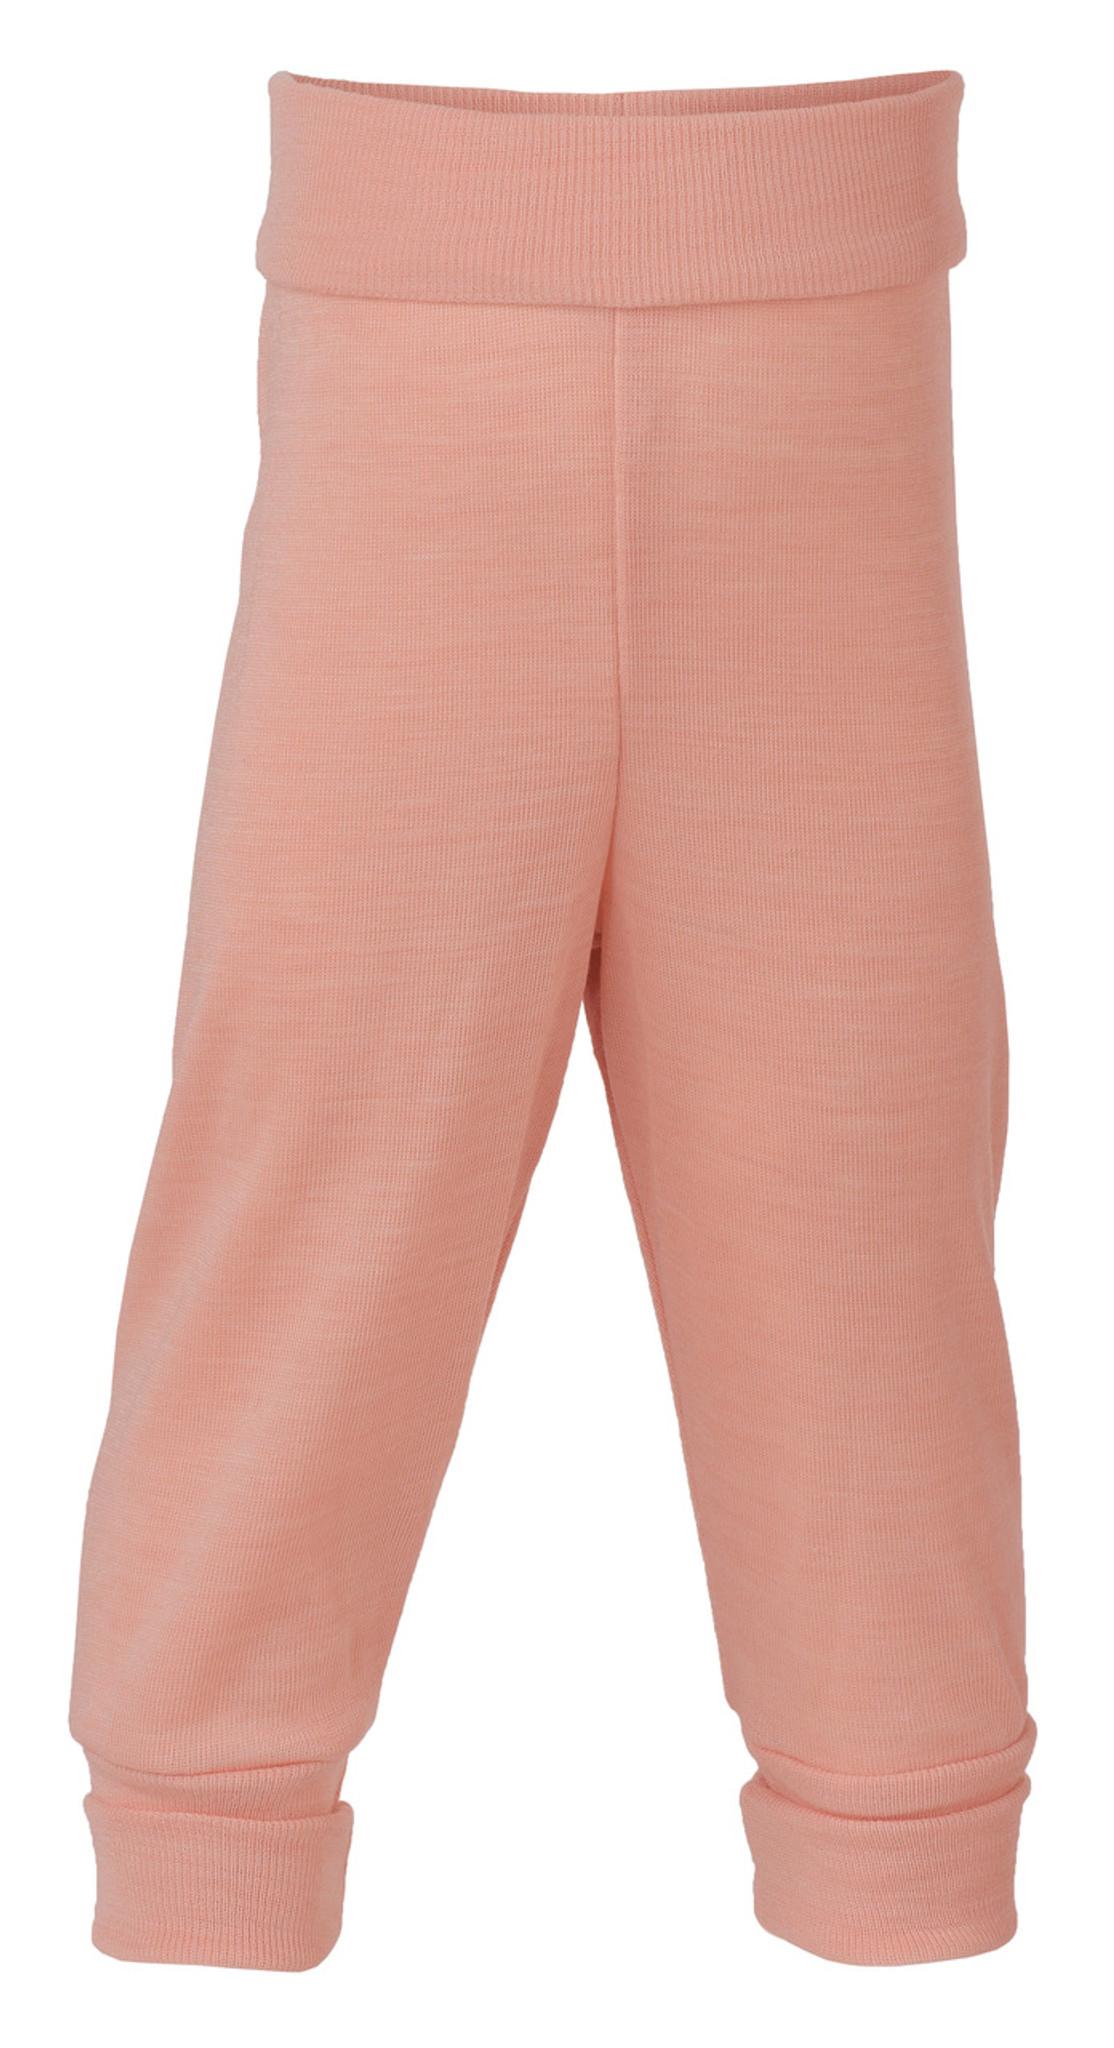 cfce4a6d1e6f Engel Baby Pants with Waistband in Organic Merino Wool Silk Salmon ...